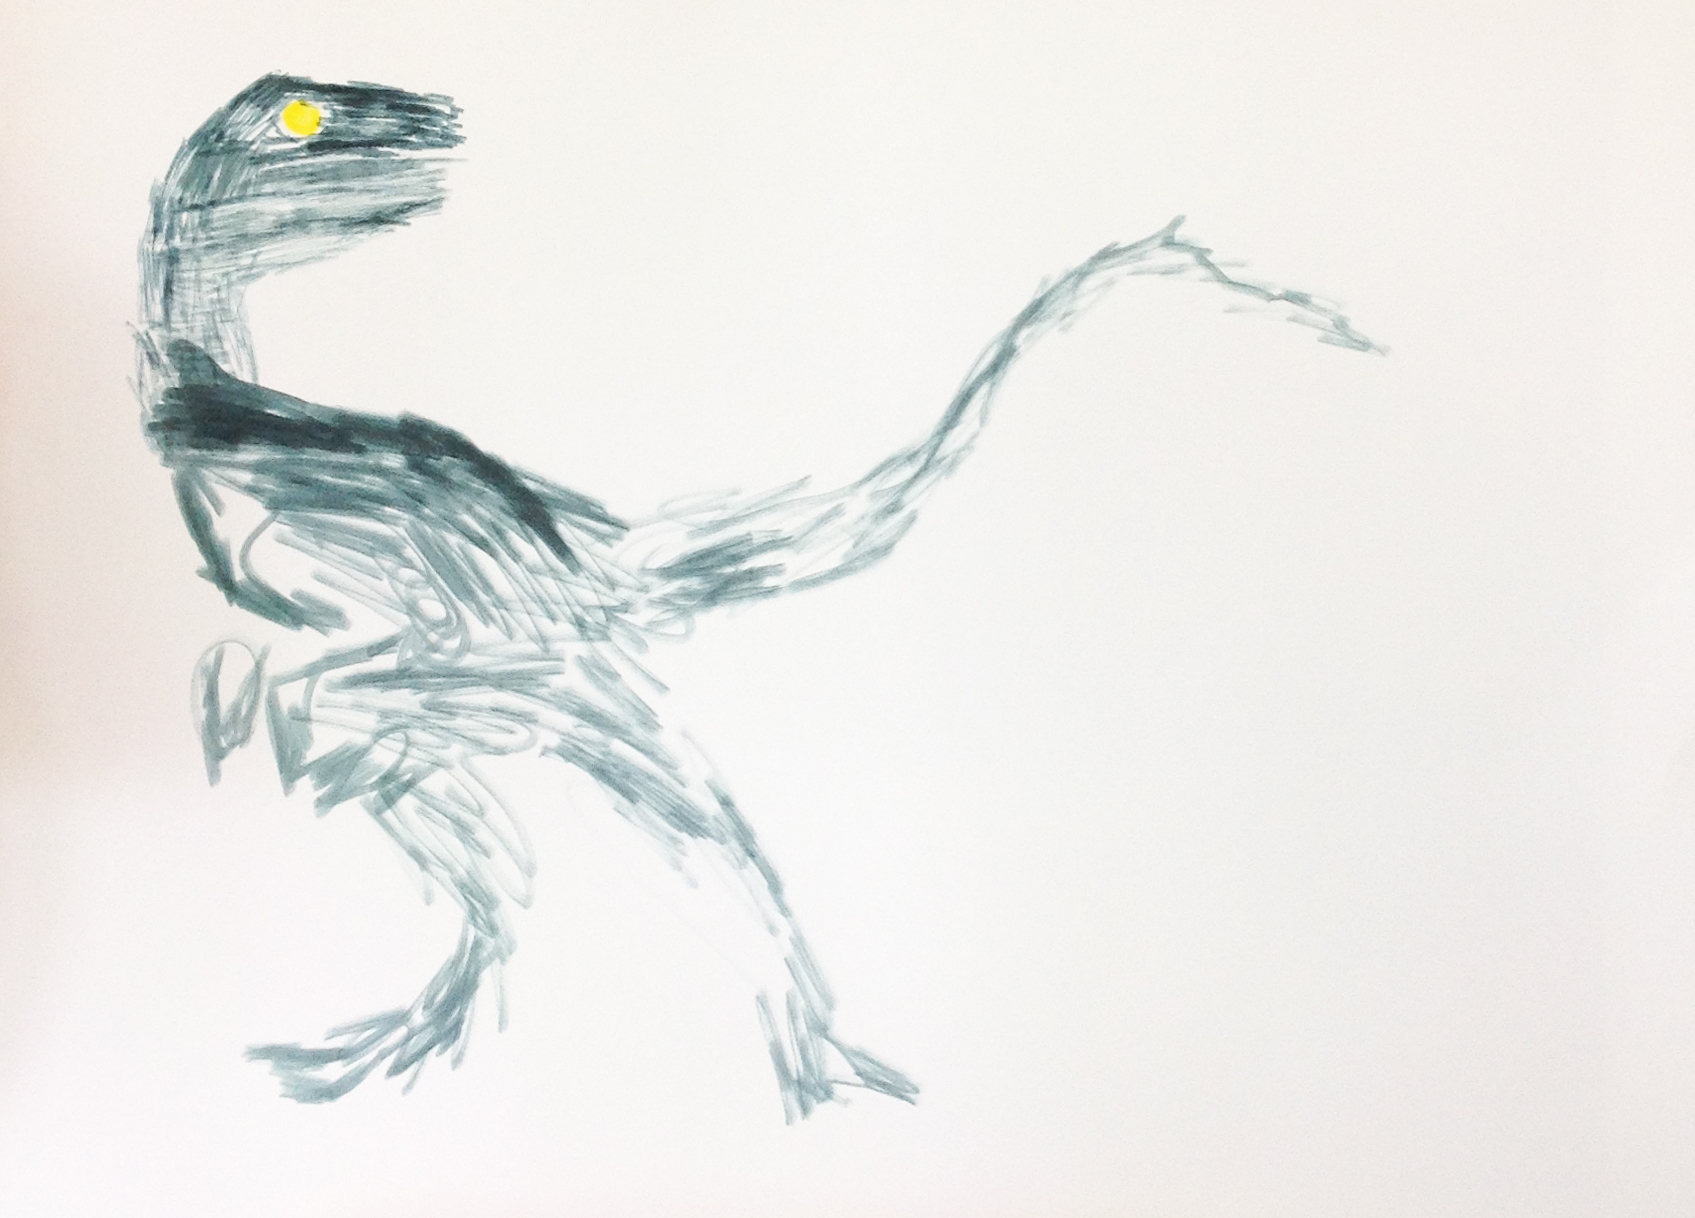 Velociraptor by Christopher Newman